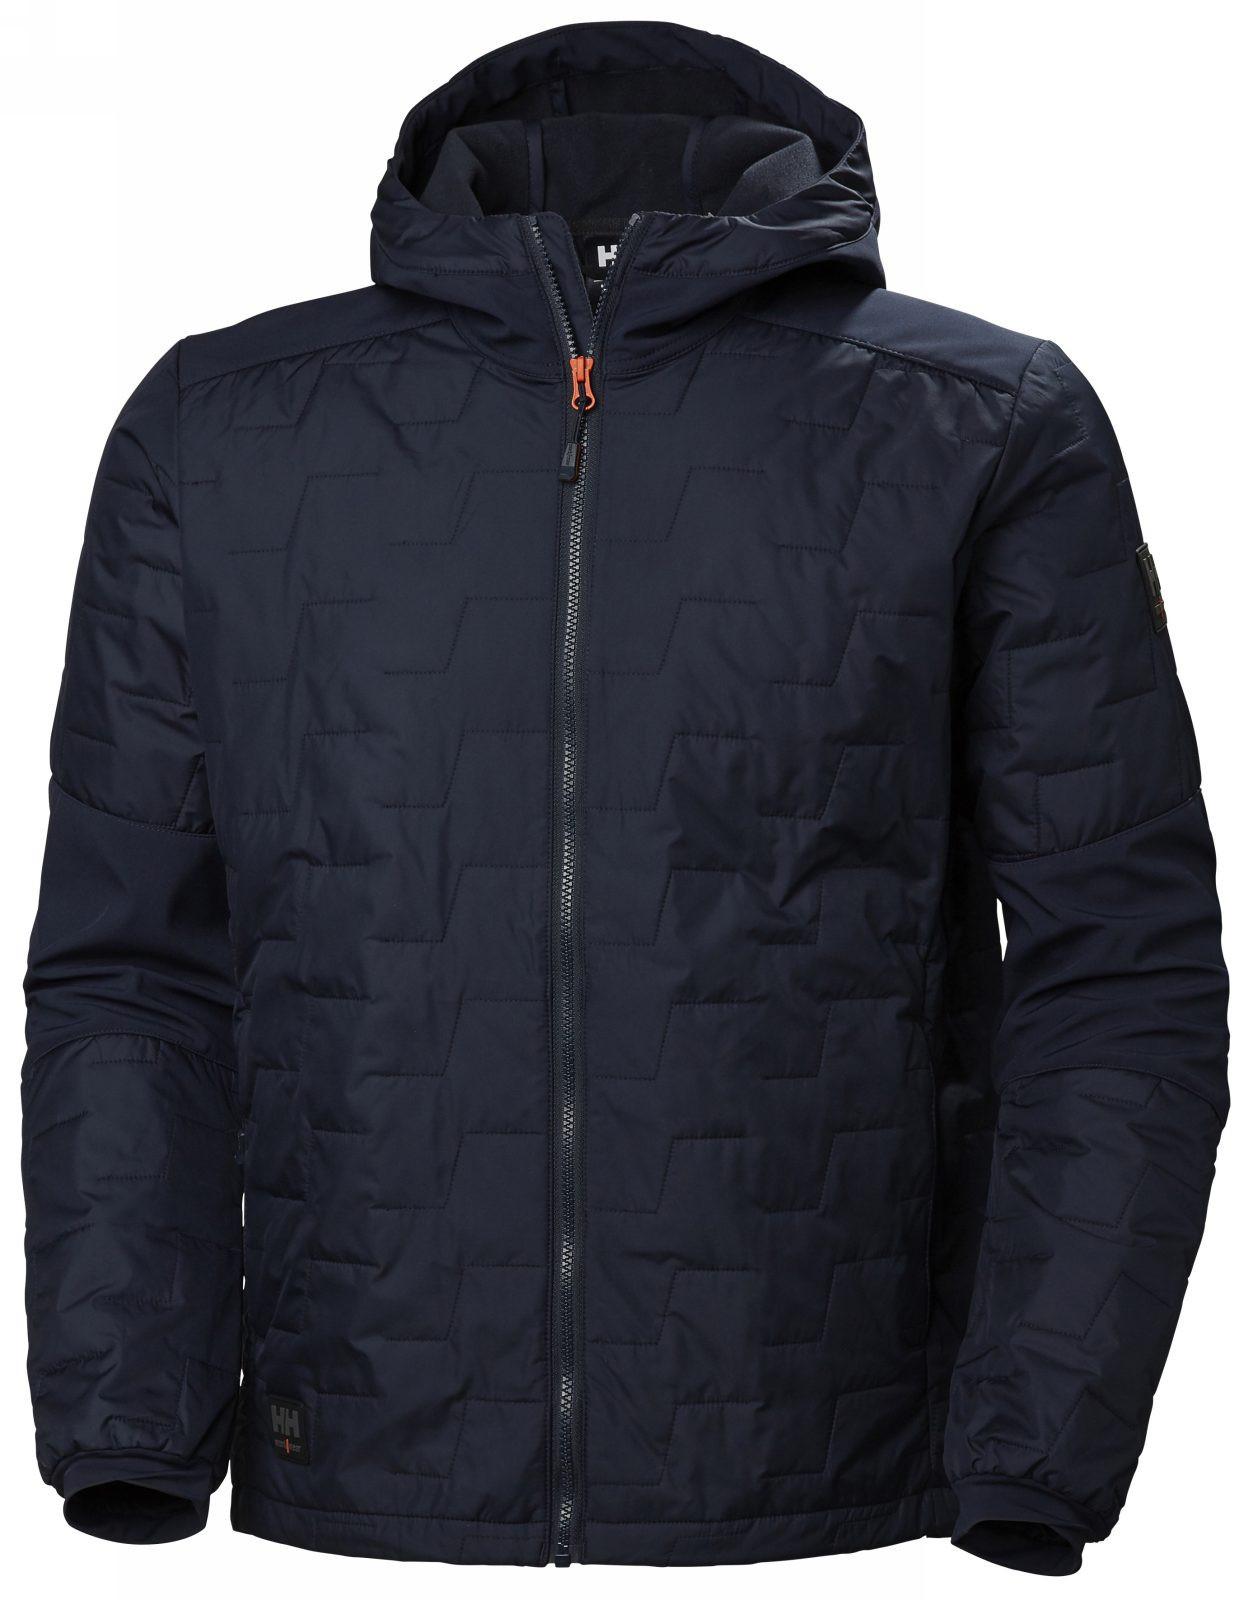 Куртка Helly Hansen Kensington Hooded Lifaloft Jacket - 73230 (Navy; M)